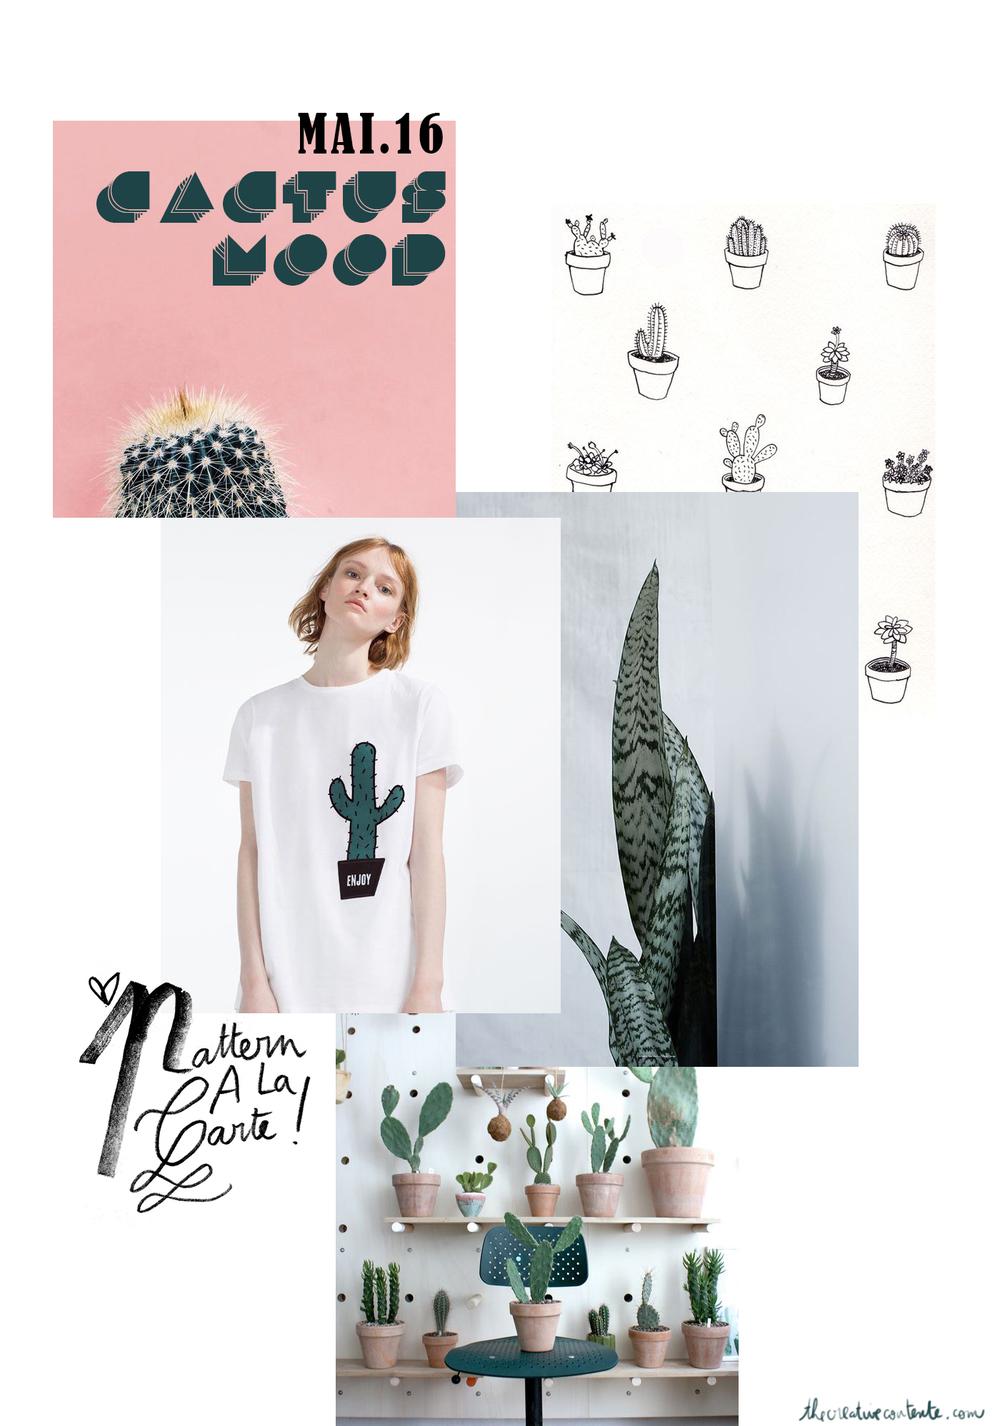 moodboard_patternalacarte_avril16_cactusB_thecreativecontente.com copie.jpg